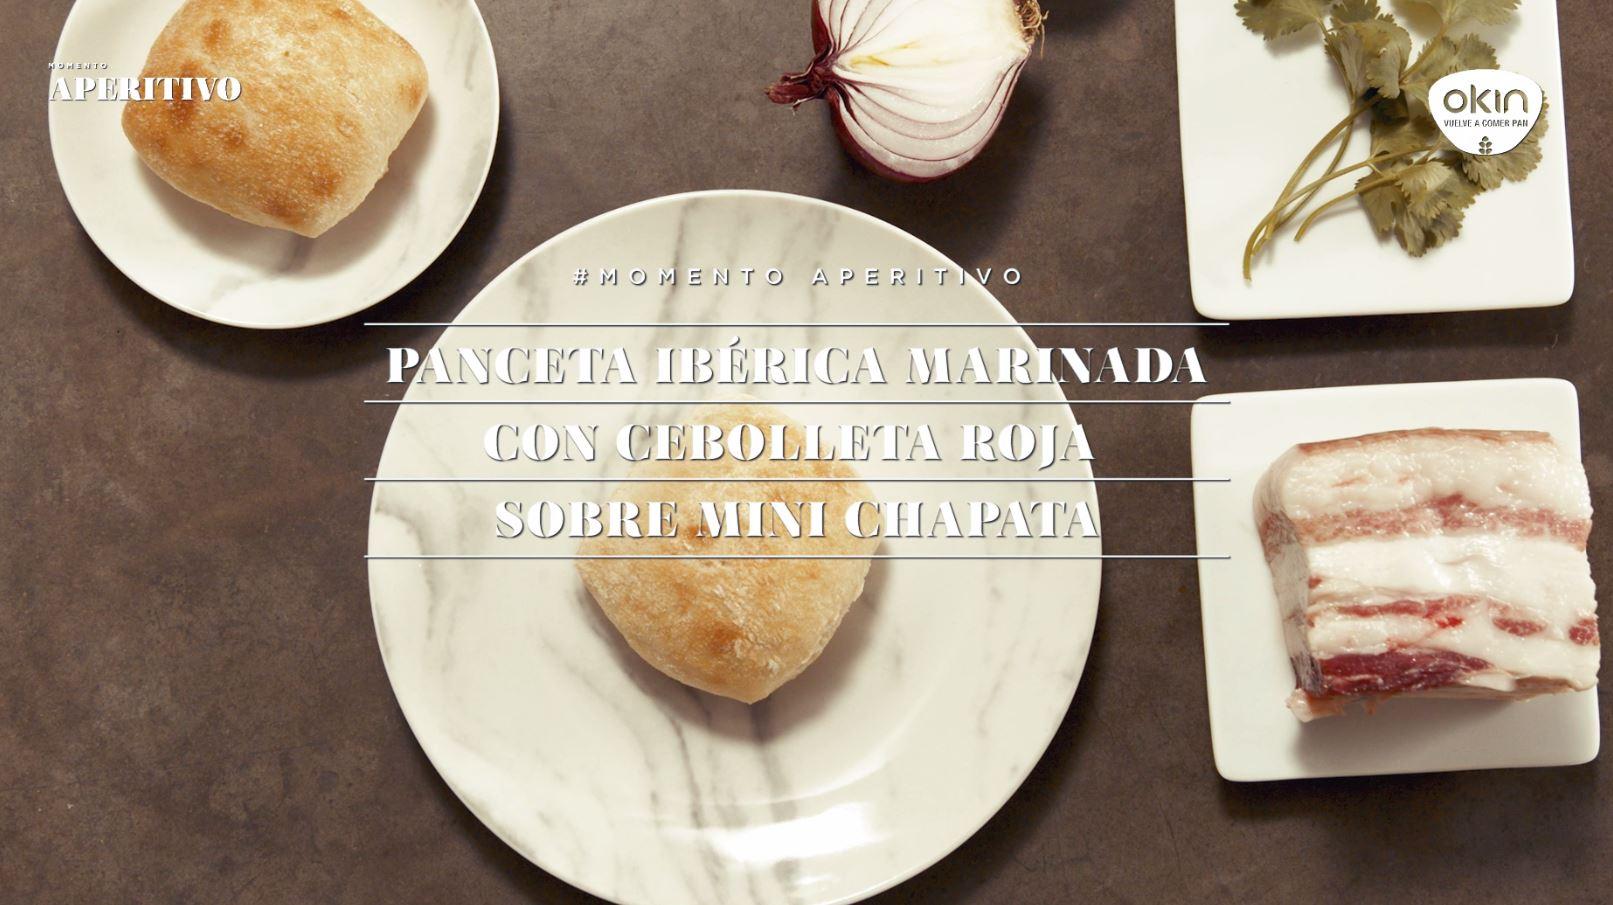 Panceta Ibérica marinada con cebolleta roja sobre Mini Chapata